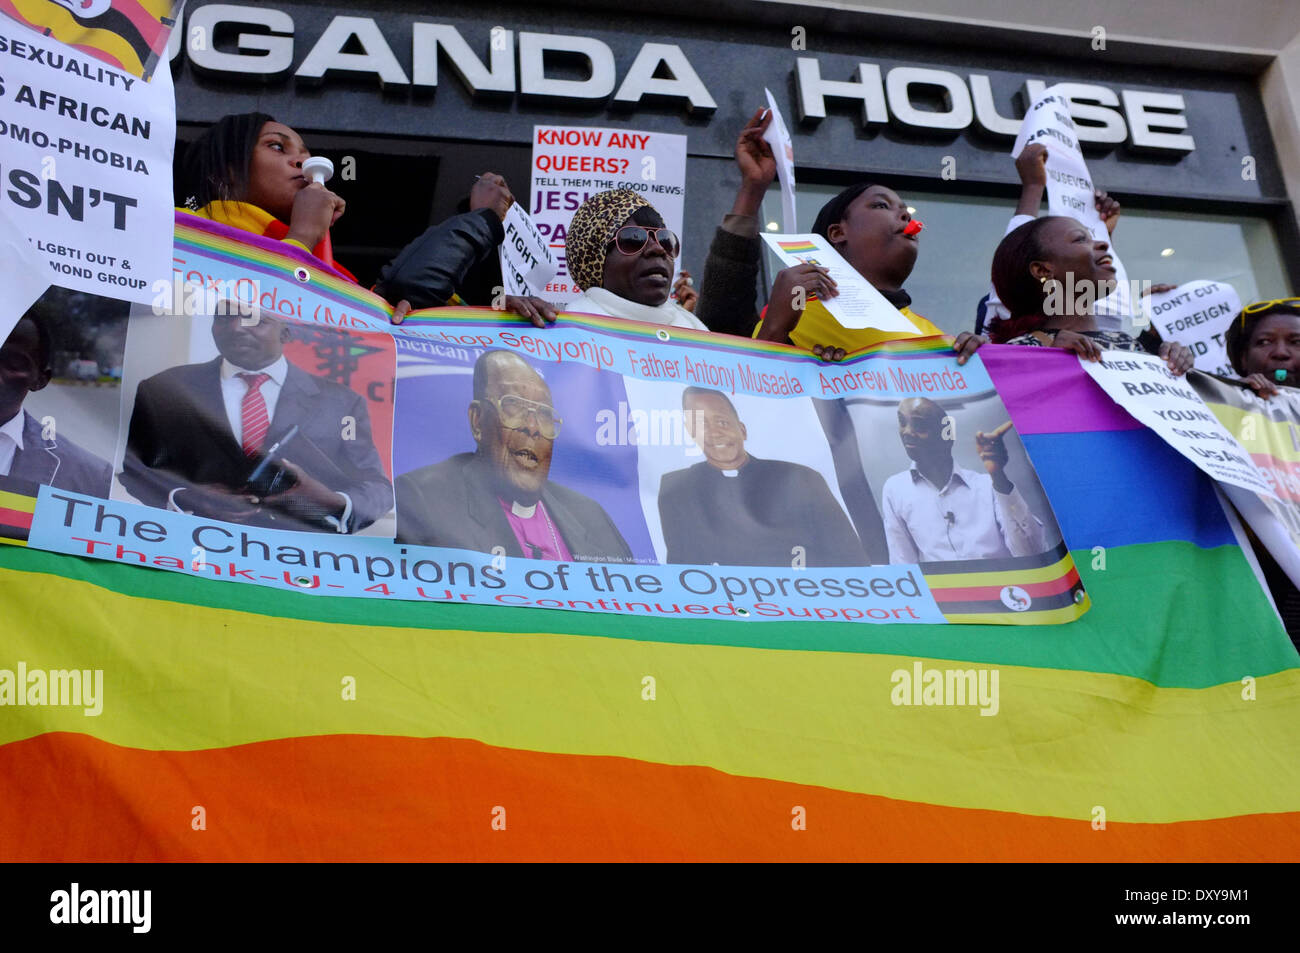 Gay Rights demonstrates outside Uganda House, Trafalgar Square, London - Stock Image